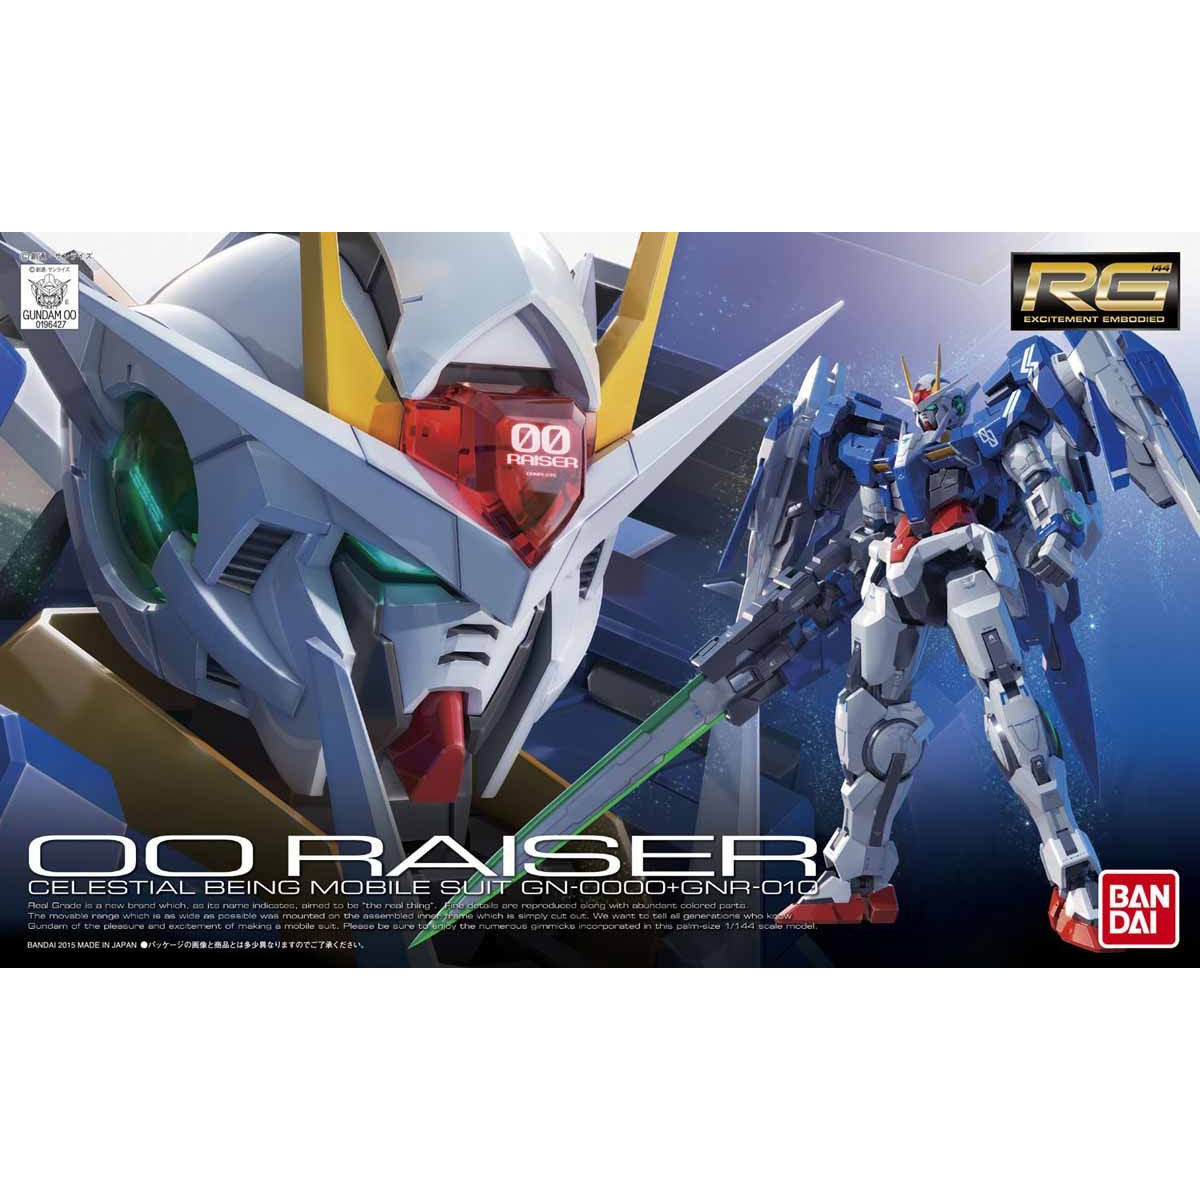 GNR-010 GUNPLA RG Real Grade 1//144 BANDAI GN-0000 OO Raiser Gundam